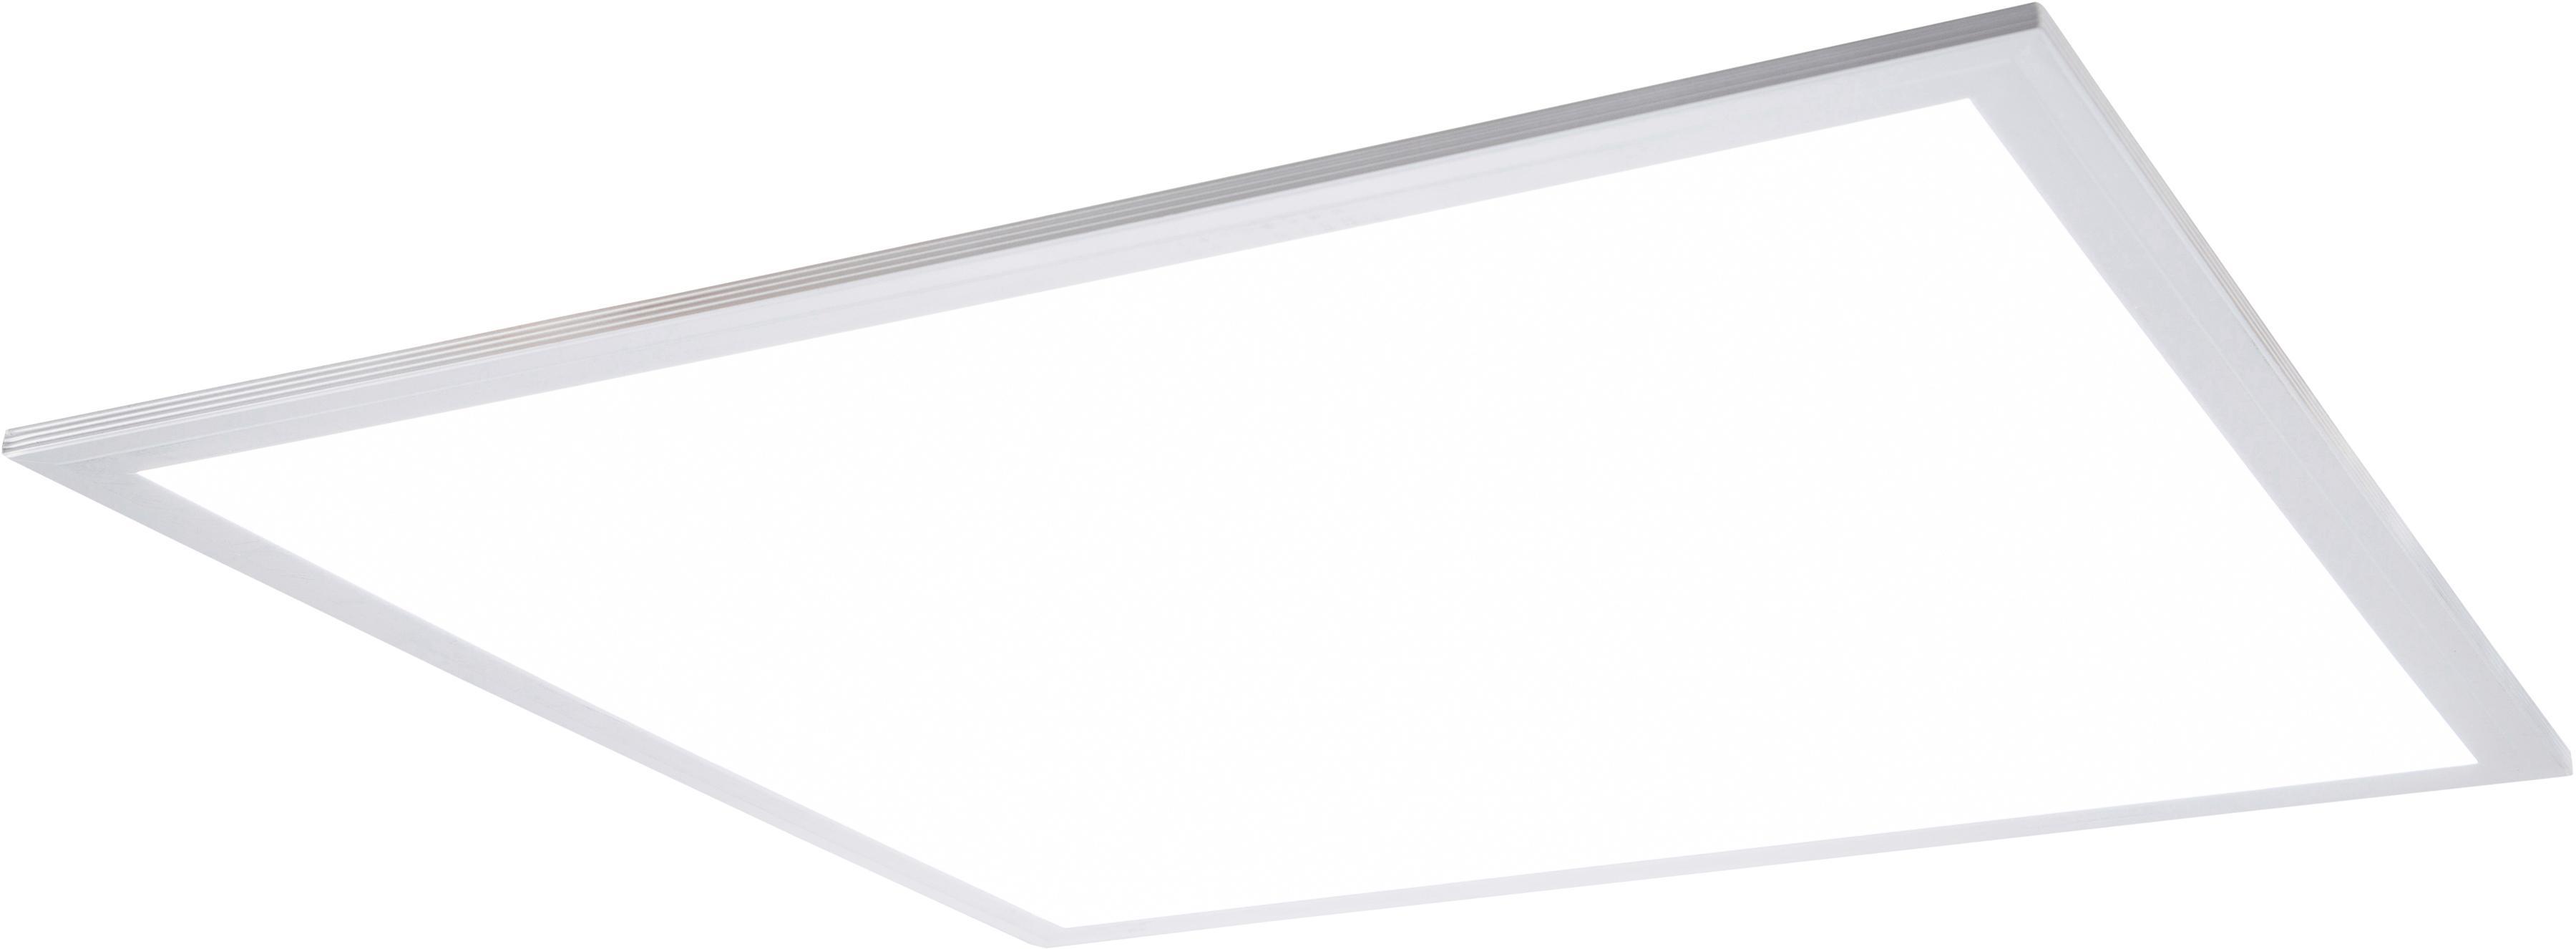 Nino Leuchten LED Deckenleuchte PANELO